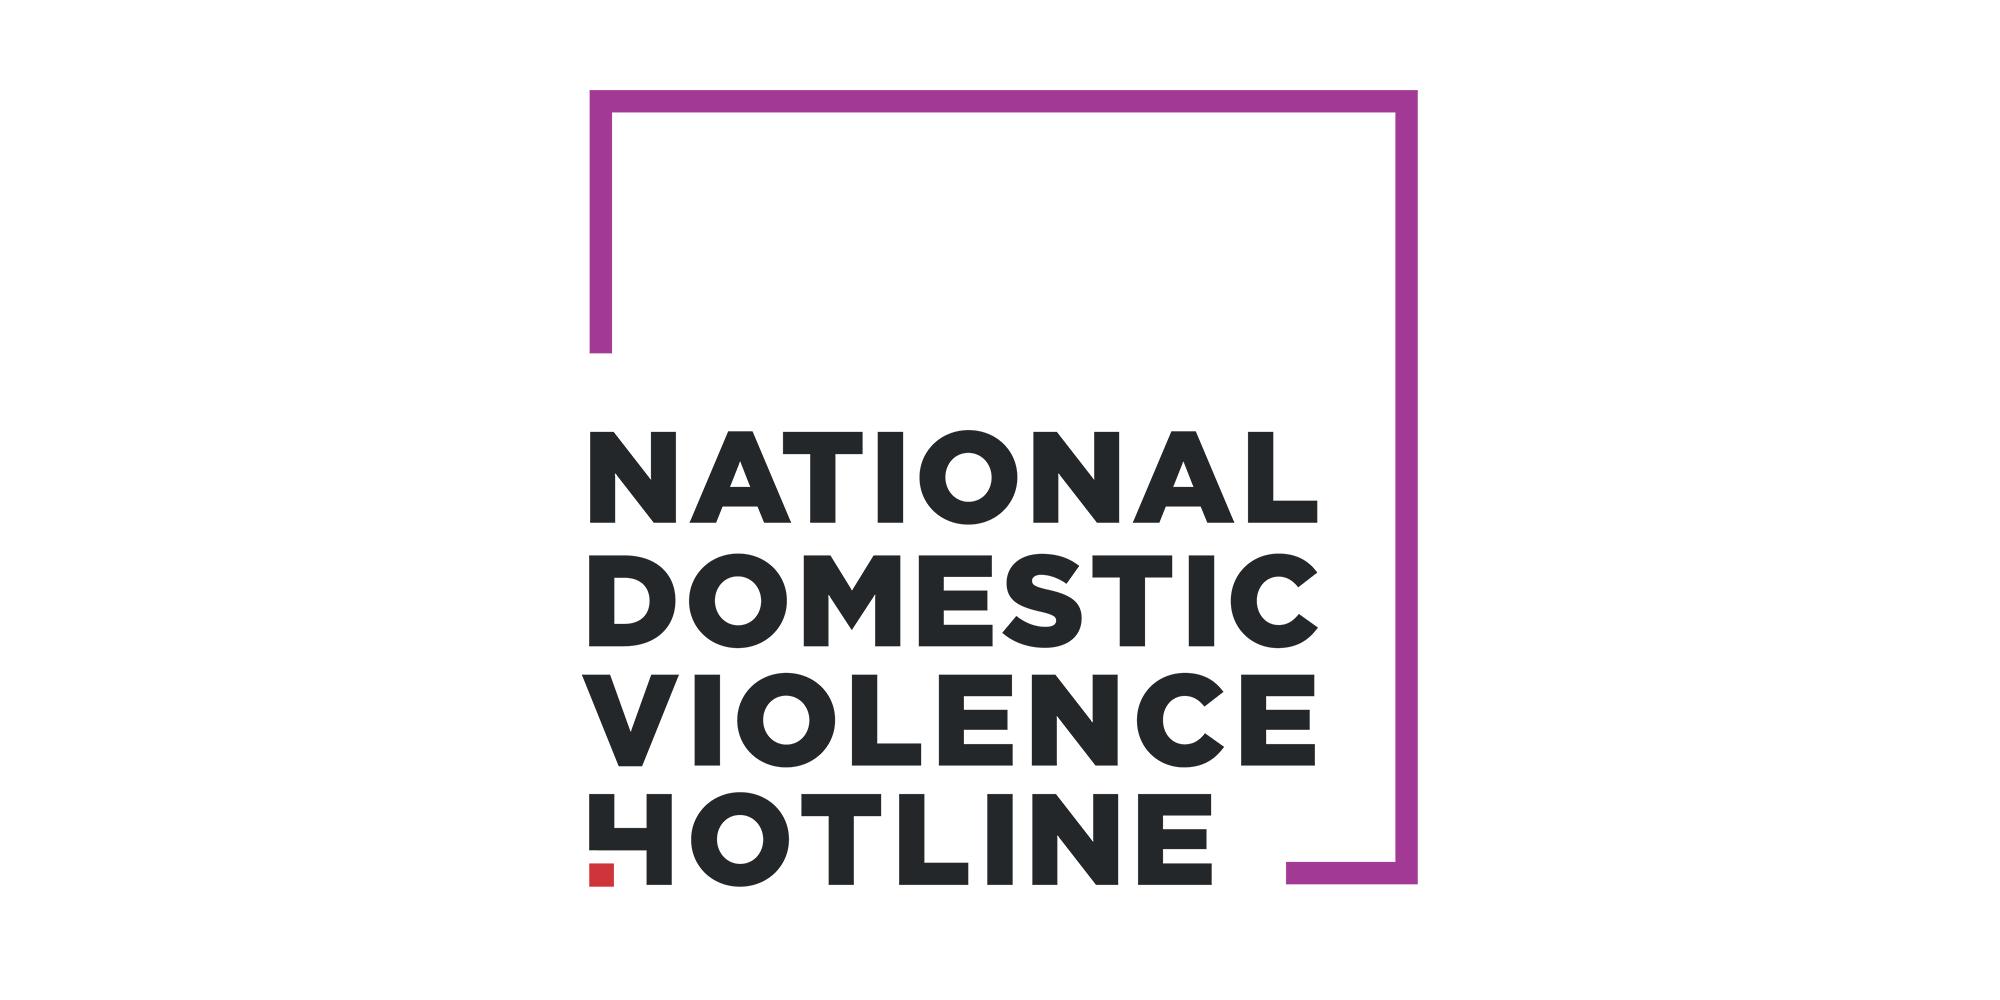 NATIONAL DOMESTIC VIOLENCE HOTLINE: